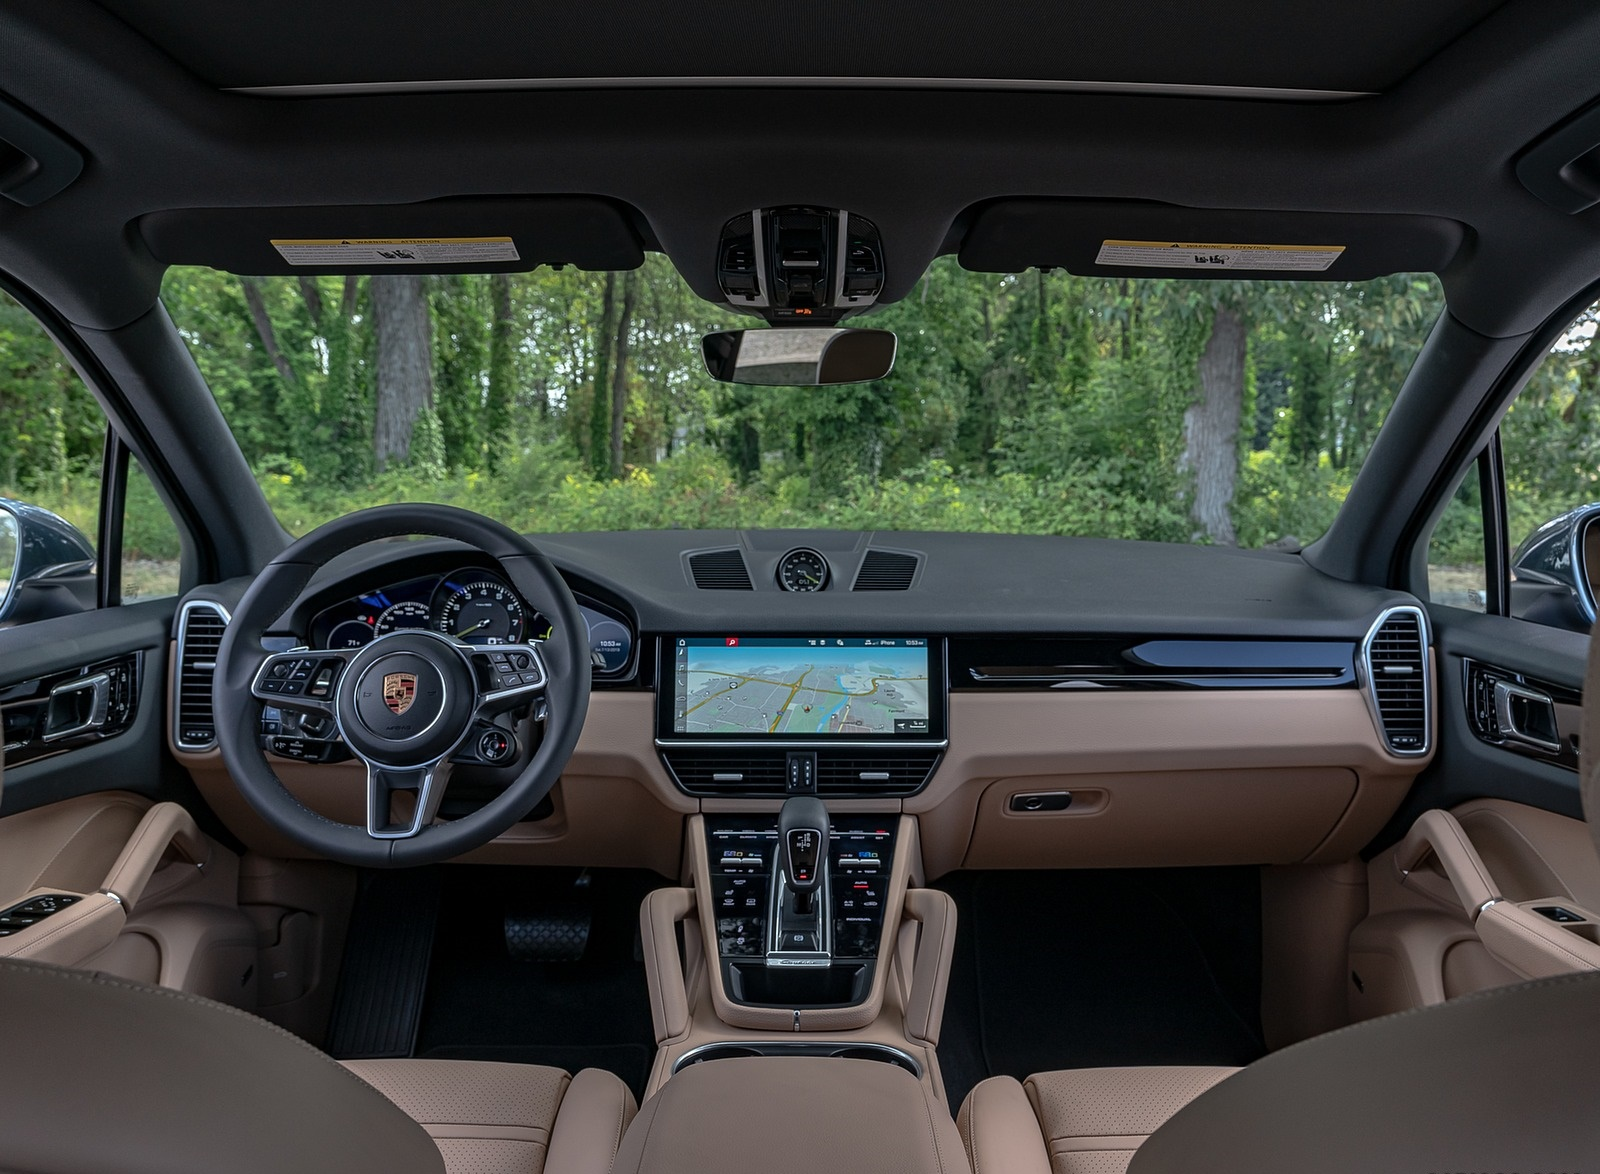 2019 Porsche Cayenne E-Hybrid (US-Spec) Interior Cockpit Wallpapers #32 of 37